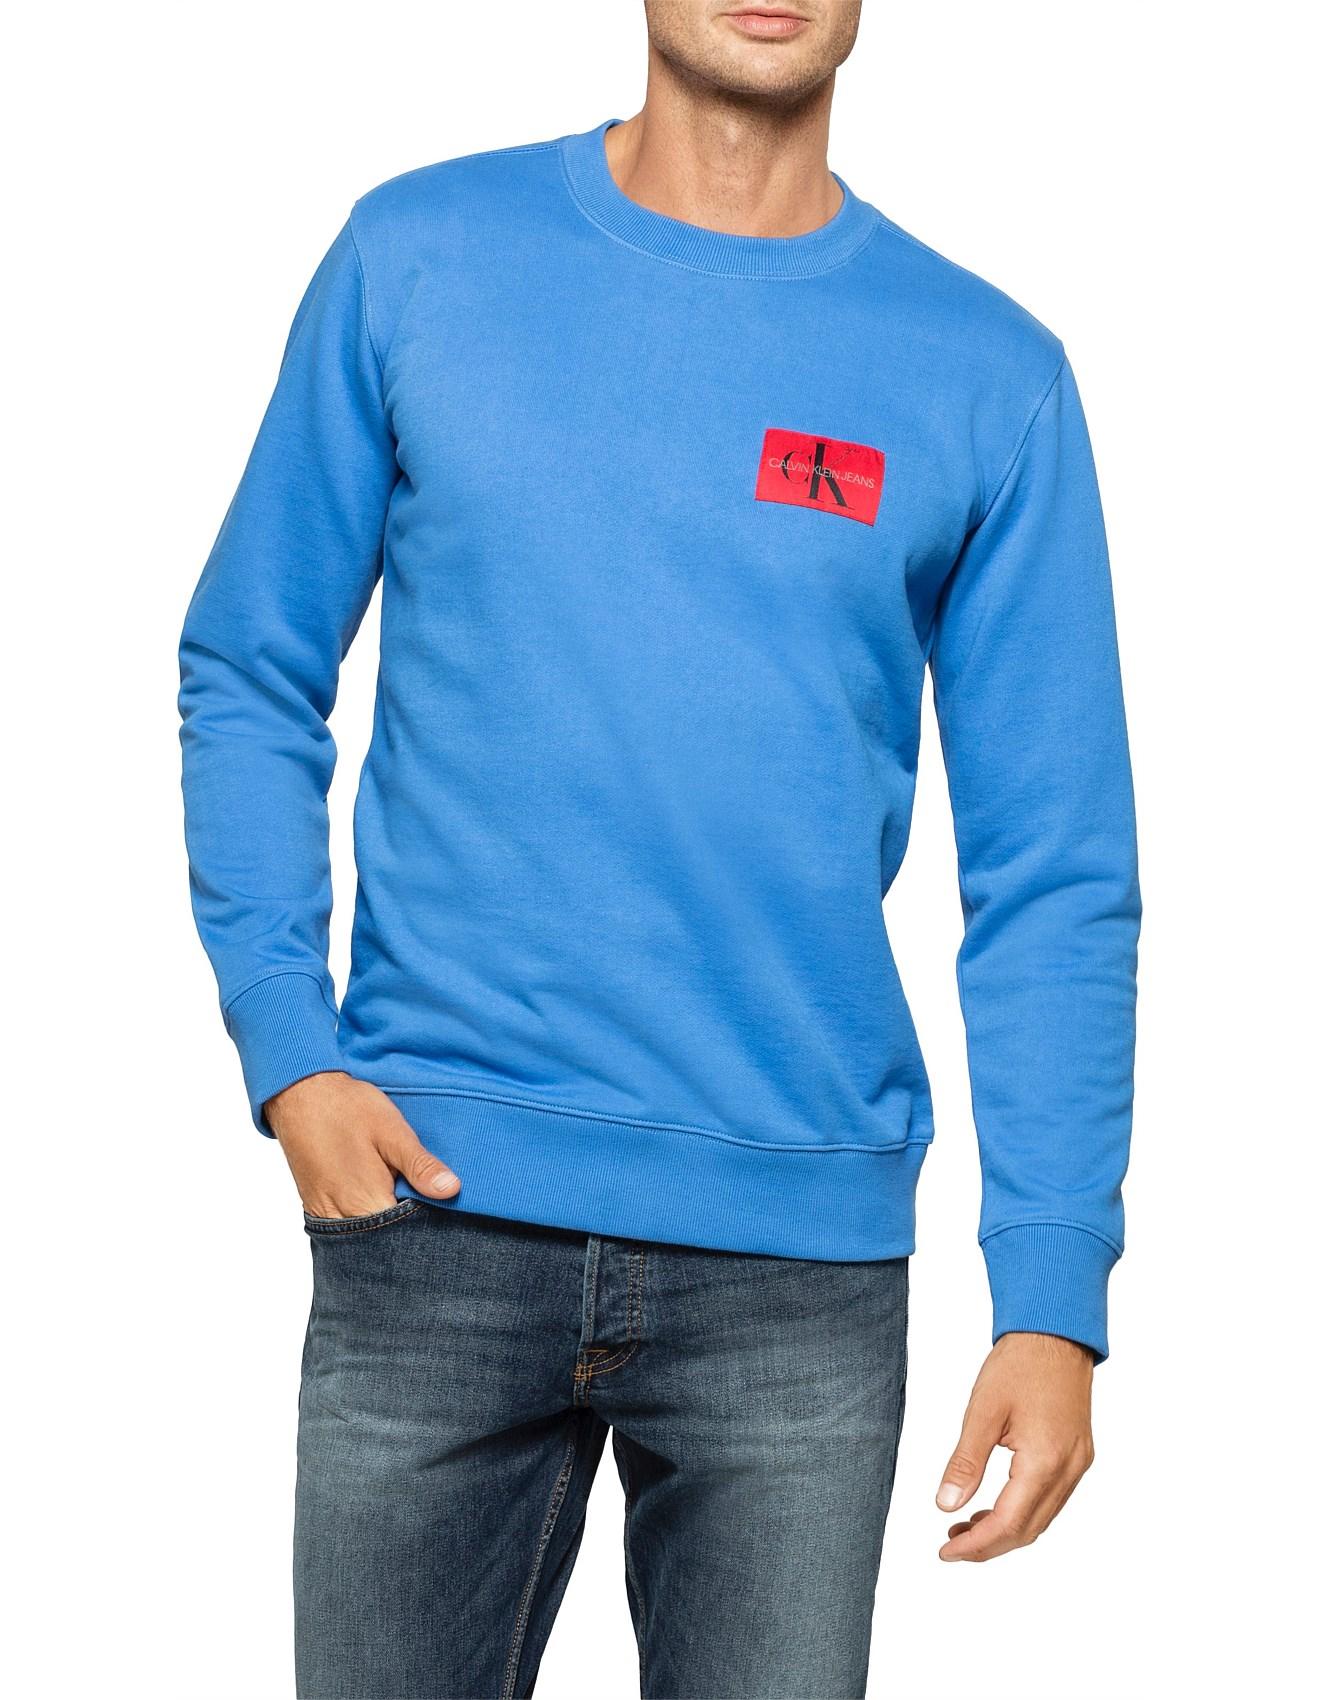 5cba5b757 Calvin Klein | Buy CK Underwear, Clothing & More | David Jones ...